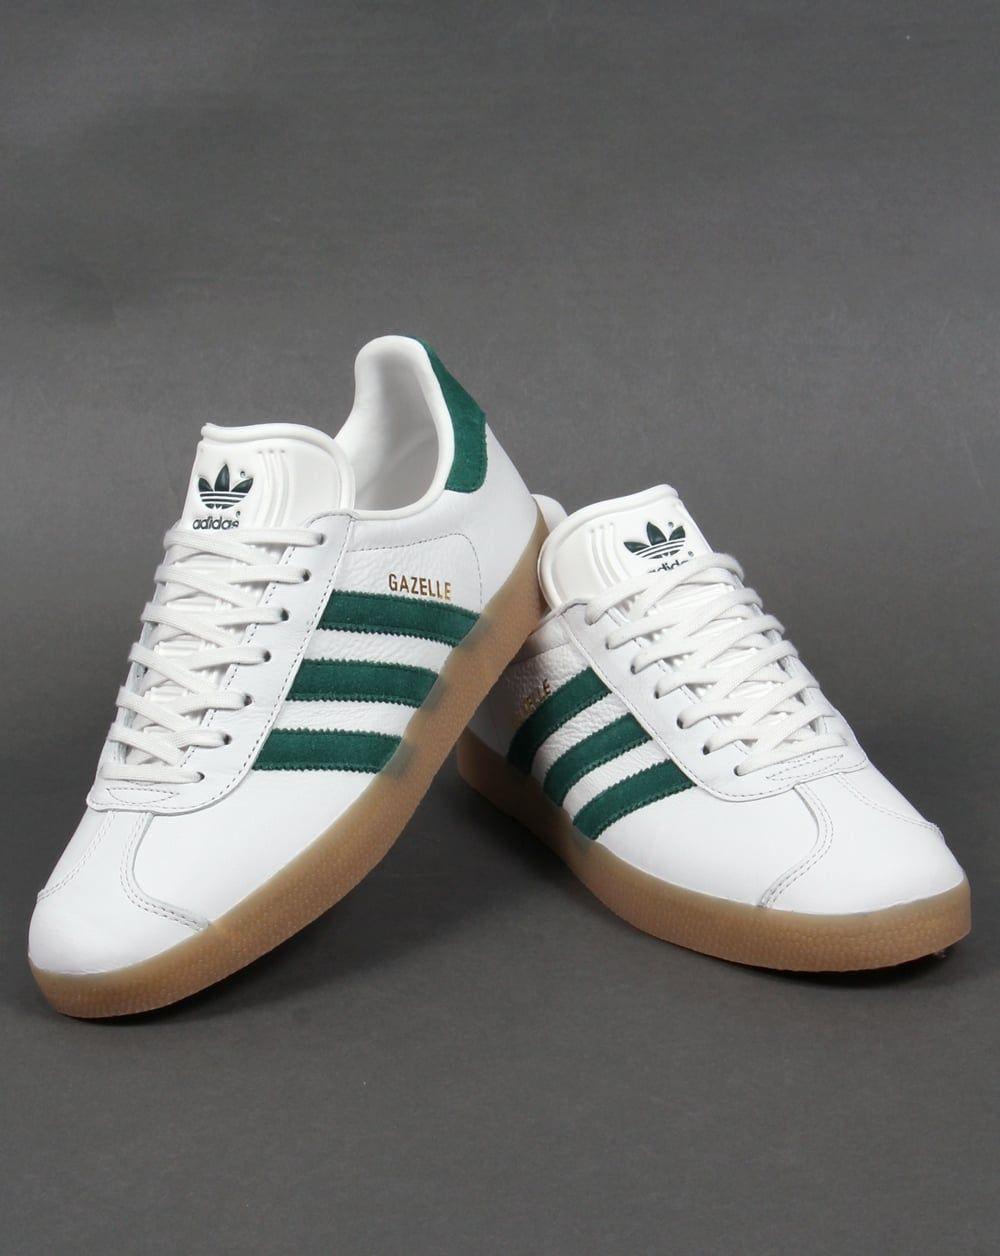 adidas gazelle white gum sole